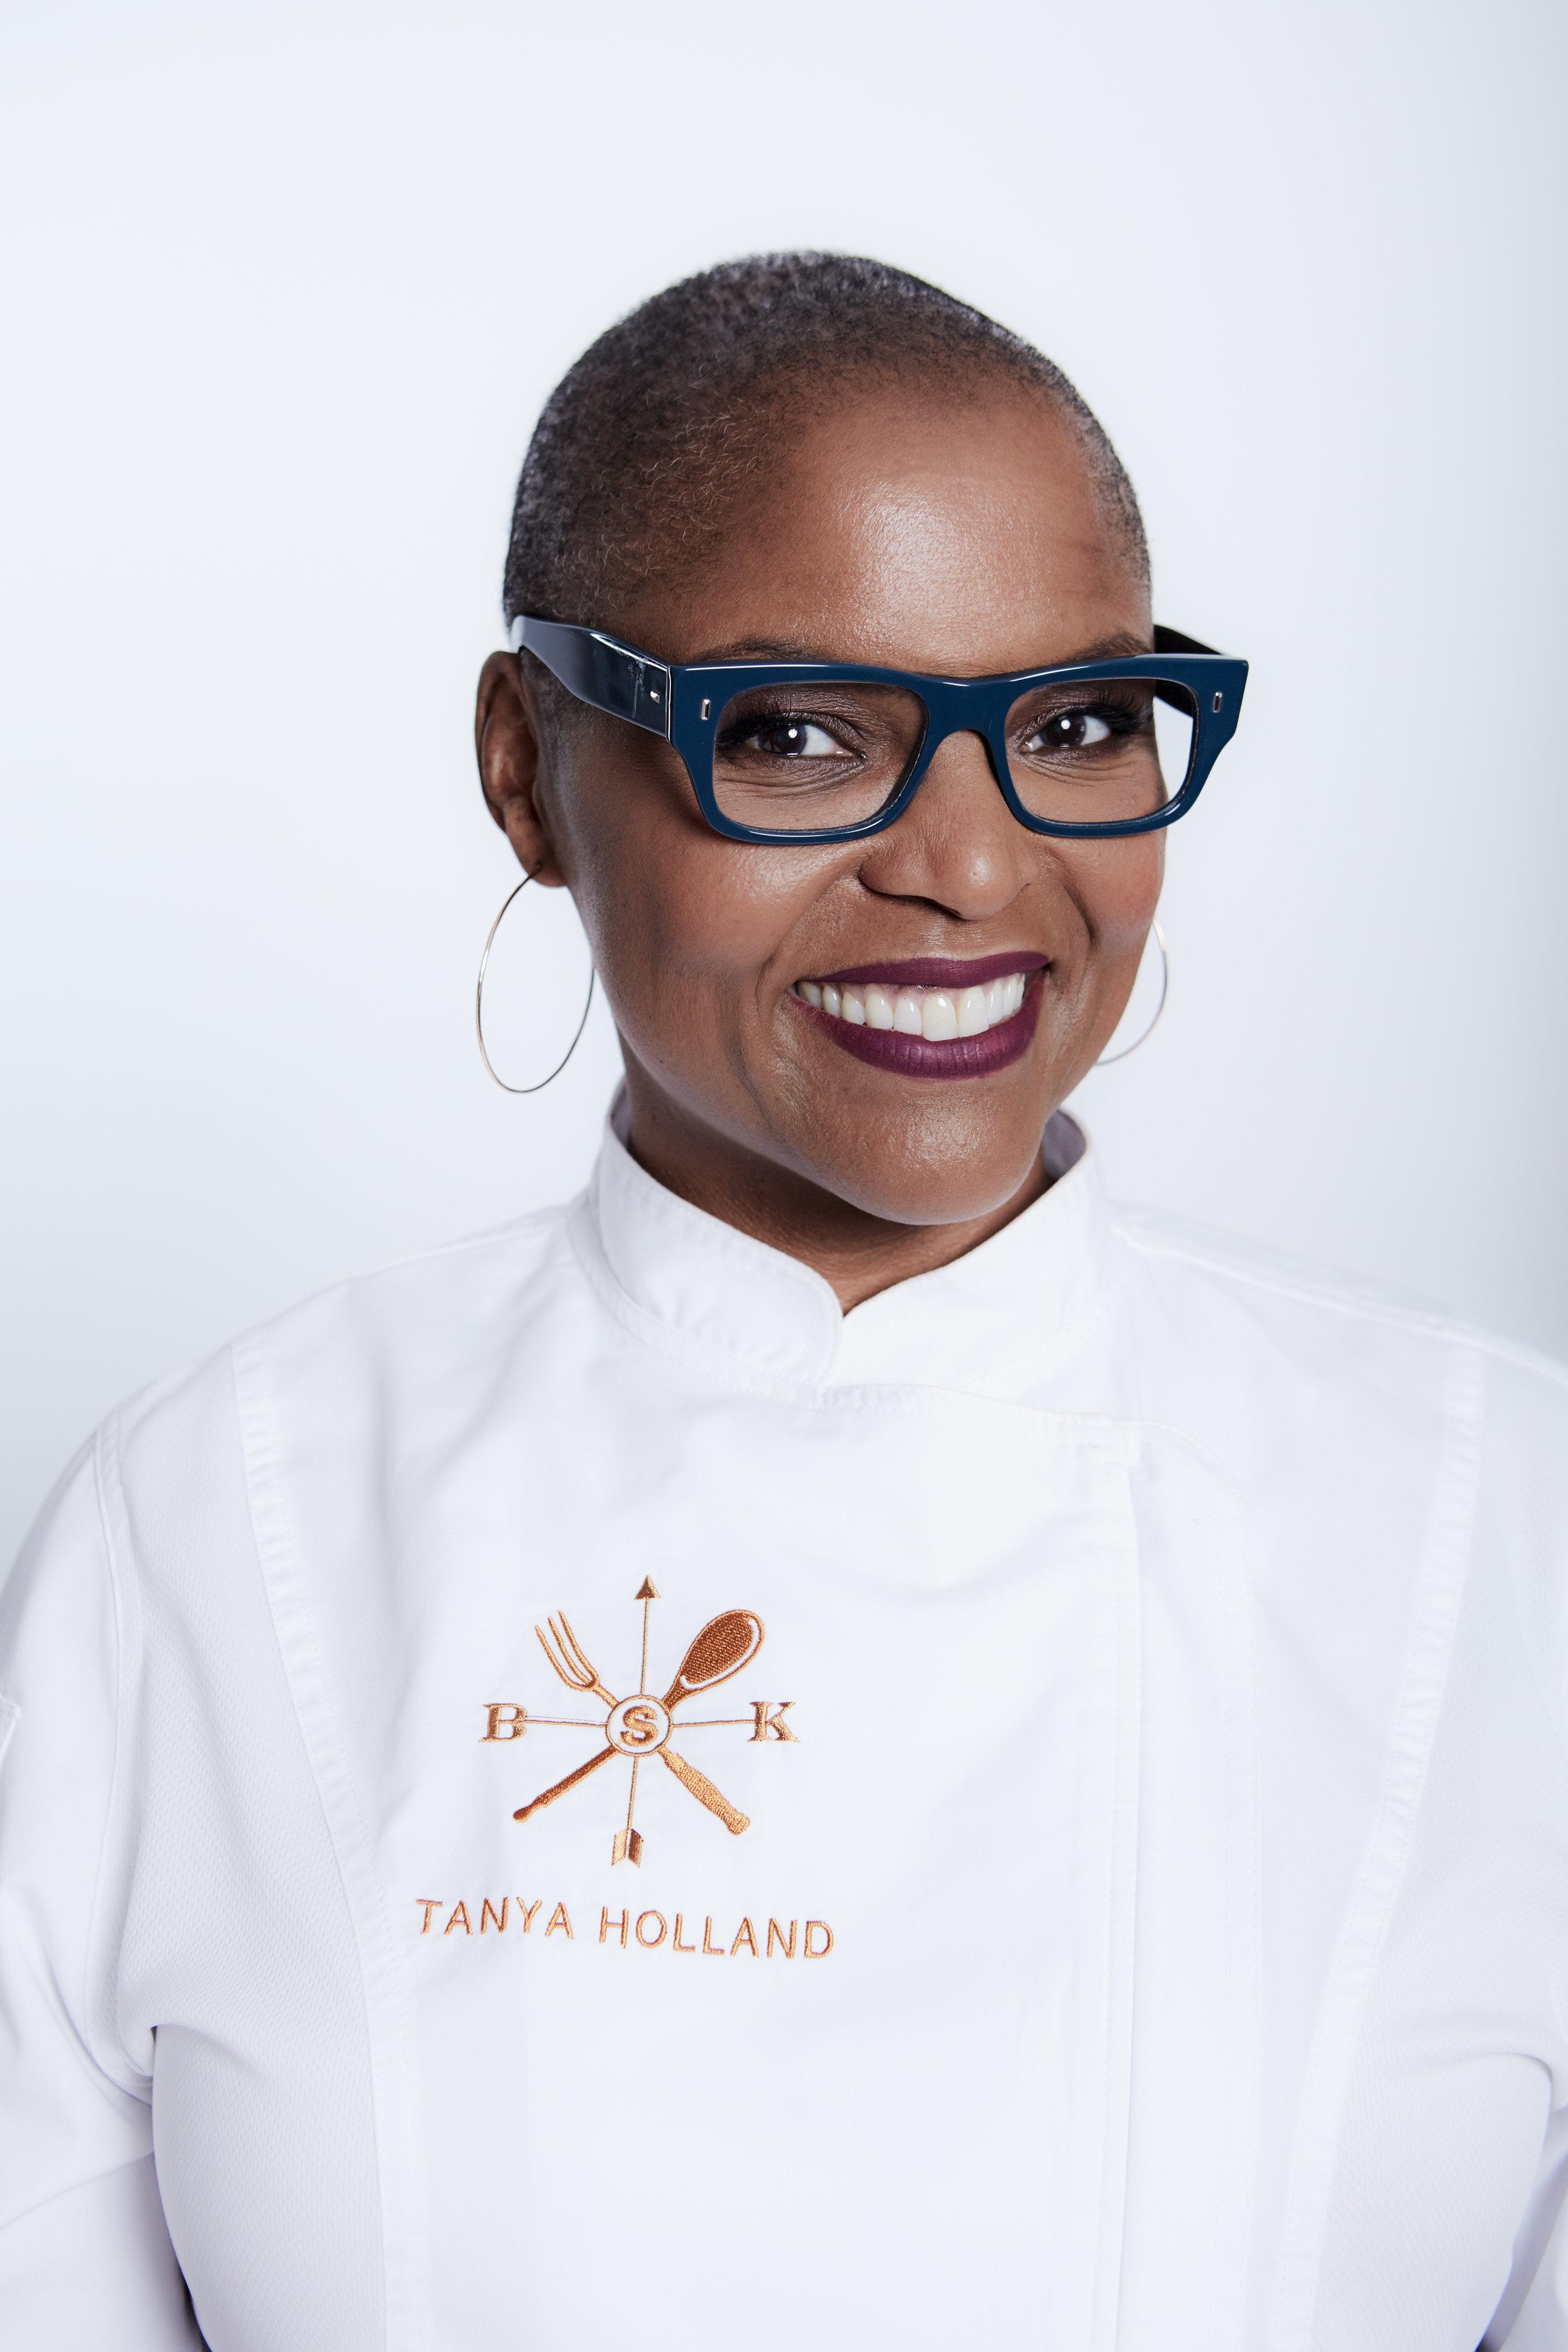 Tanya Holland of Brown Sugar Kitchen - Award-winning Author, Restauranteur, and Executive Chef